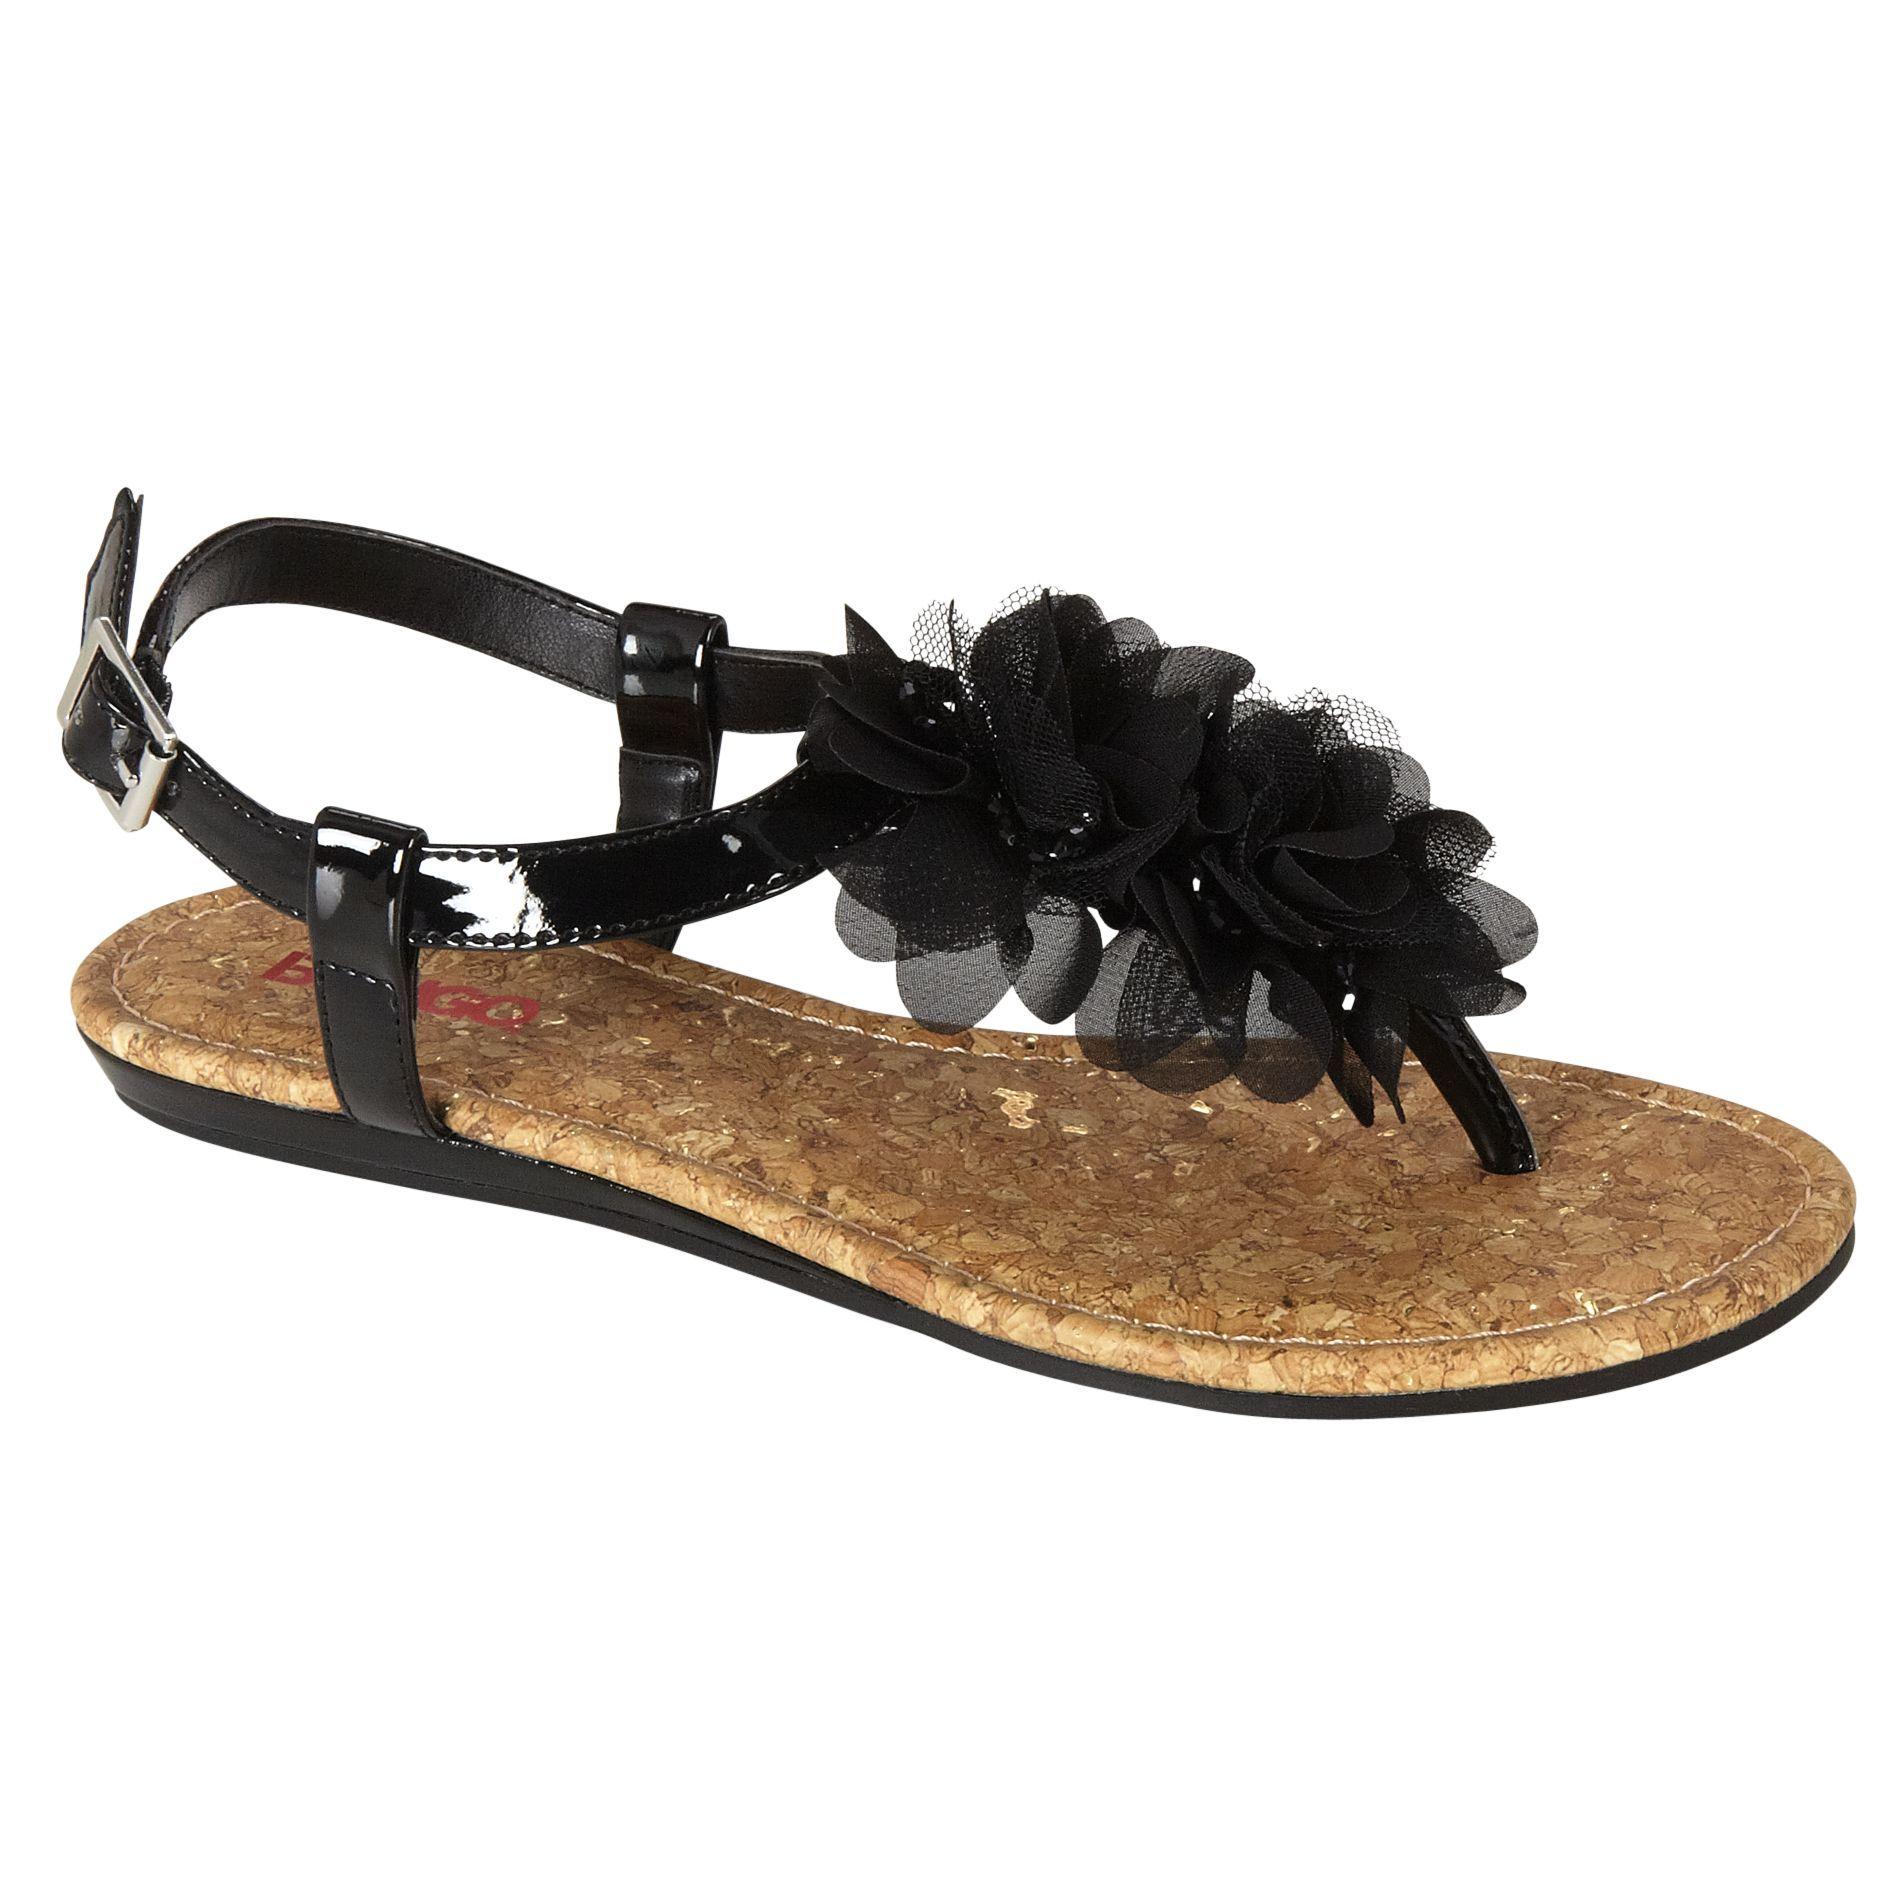 Bongo Women S Sandal Malibu Black from